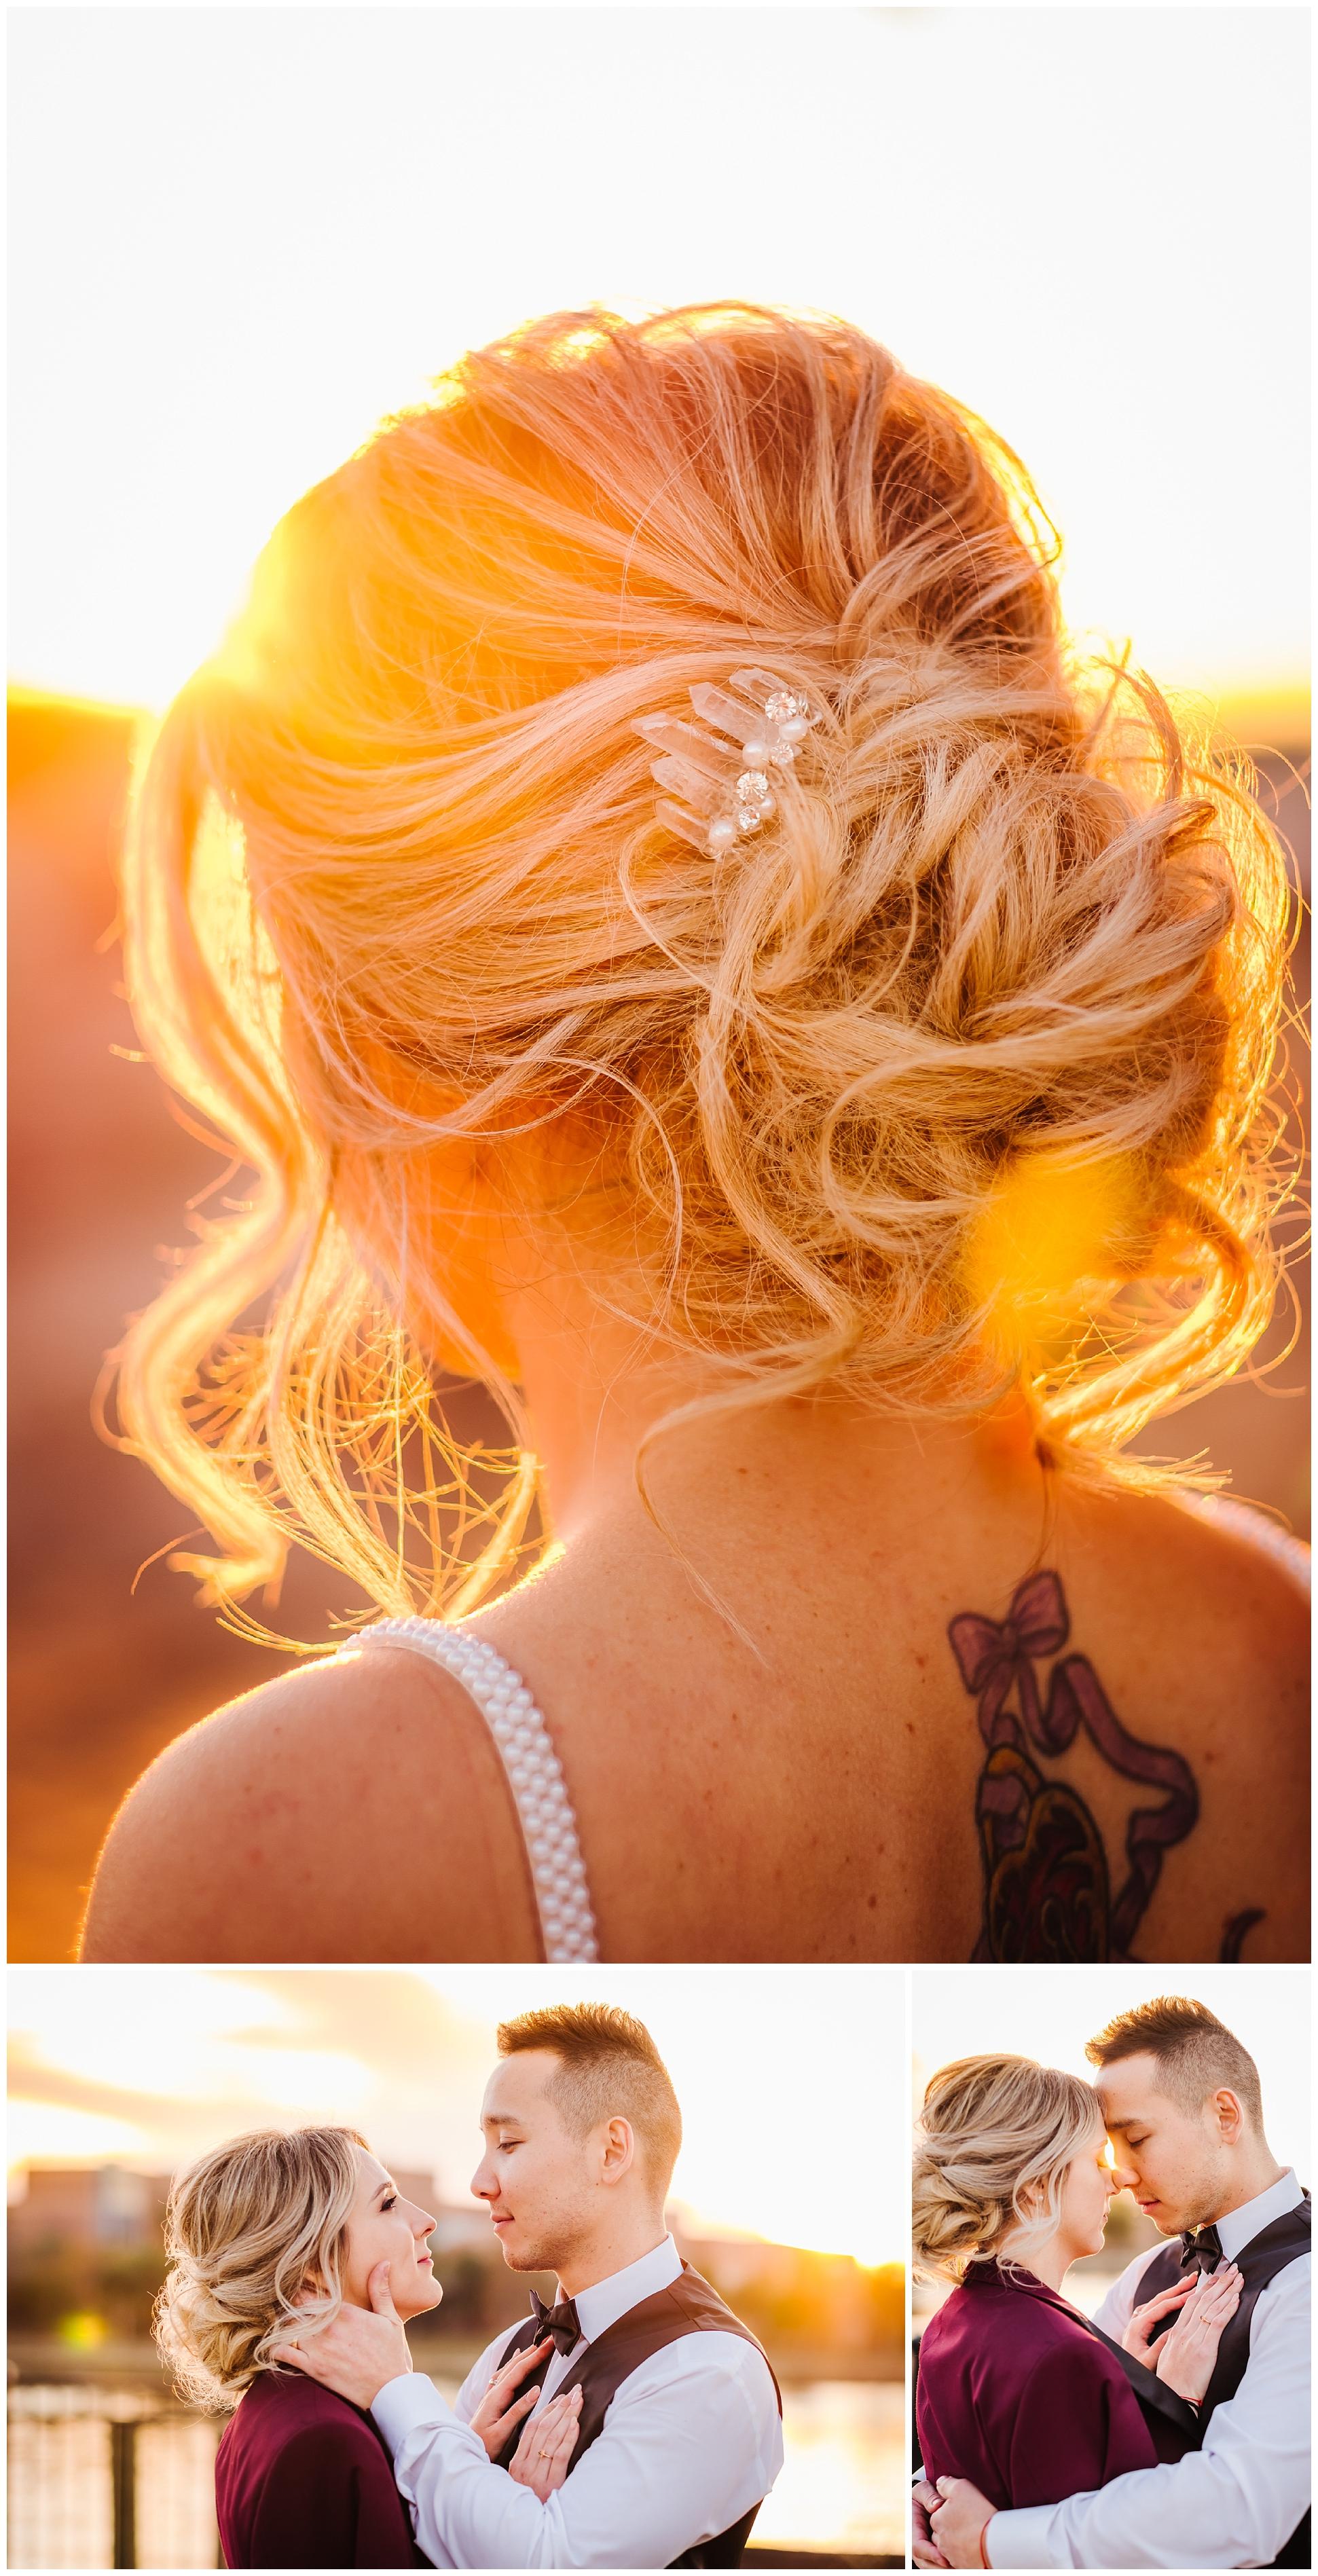 tampa-armeture-wedding-photographer-edgy-industrial-downtown-fancy-free-nursery-tattoo-burgandy-velvet_0057.jpg